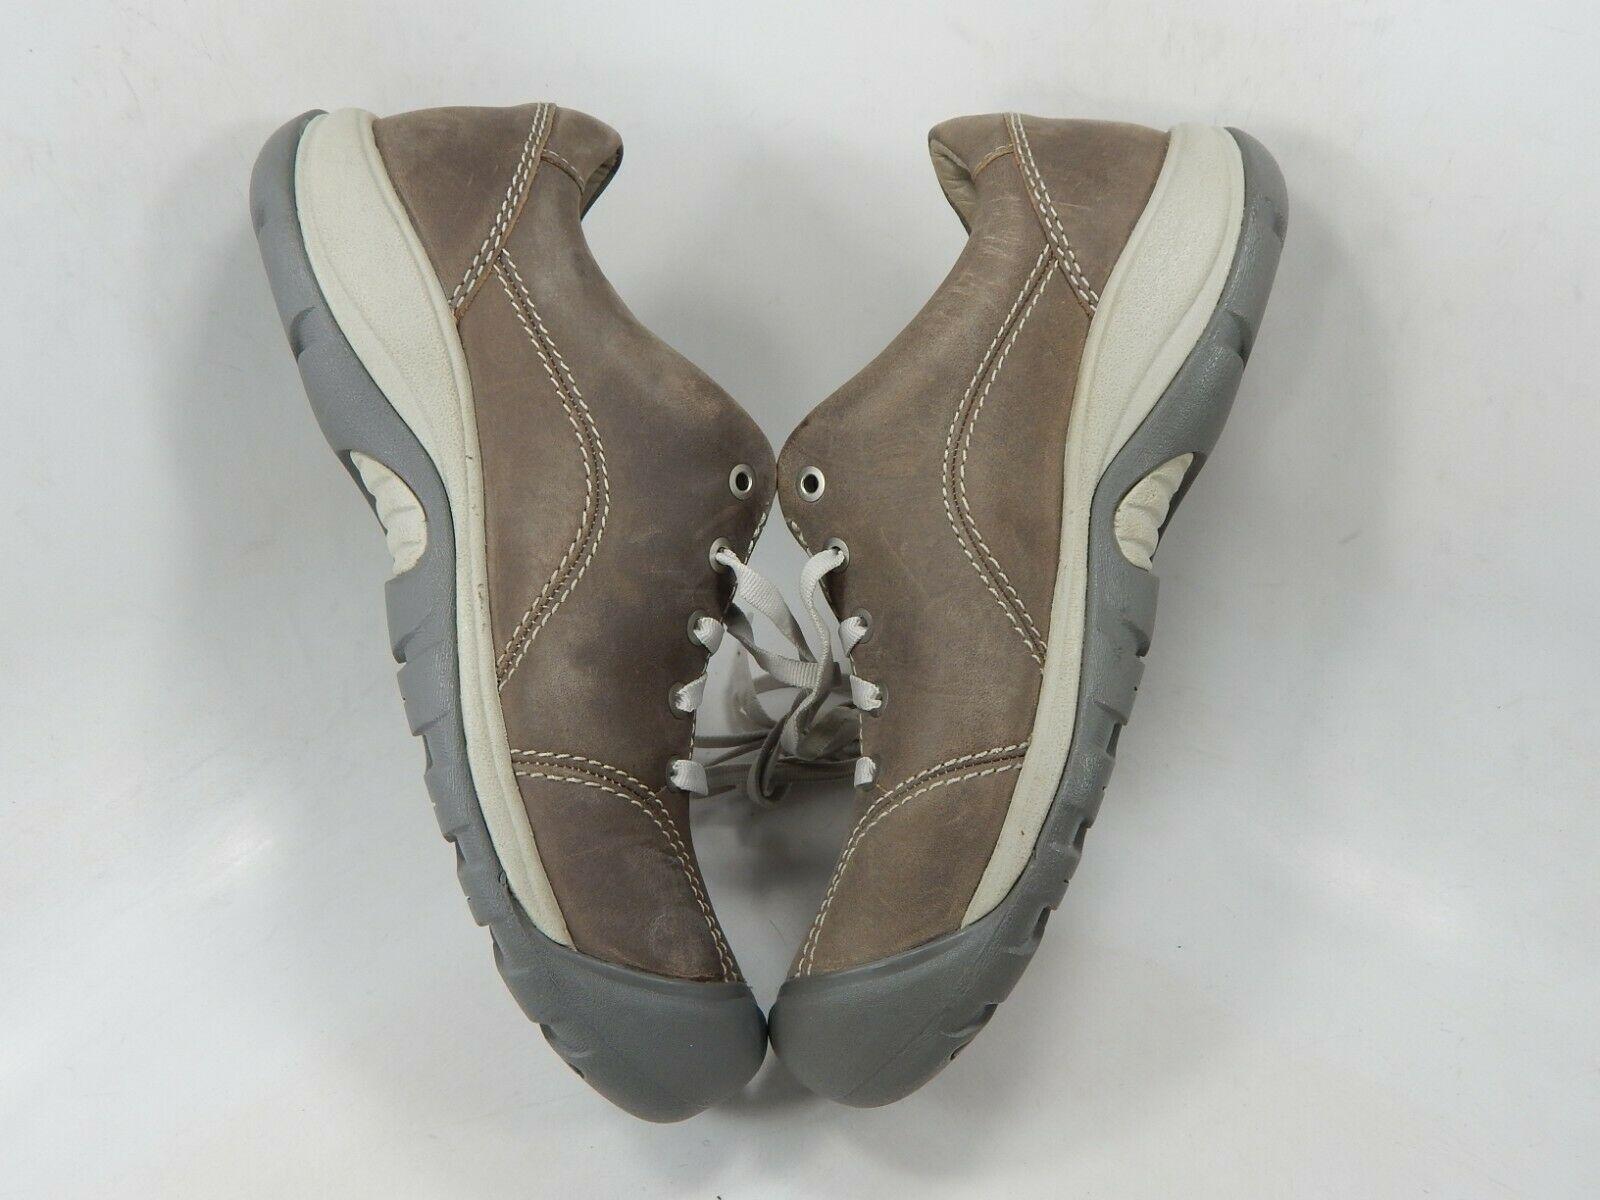 Keen Presidio II Misura 7 M (B) Eu 37.5 Donna Casual Oxford Shoes Paloma 1018316 image 7